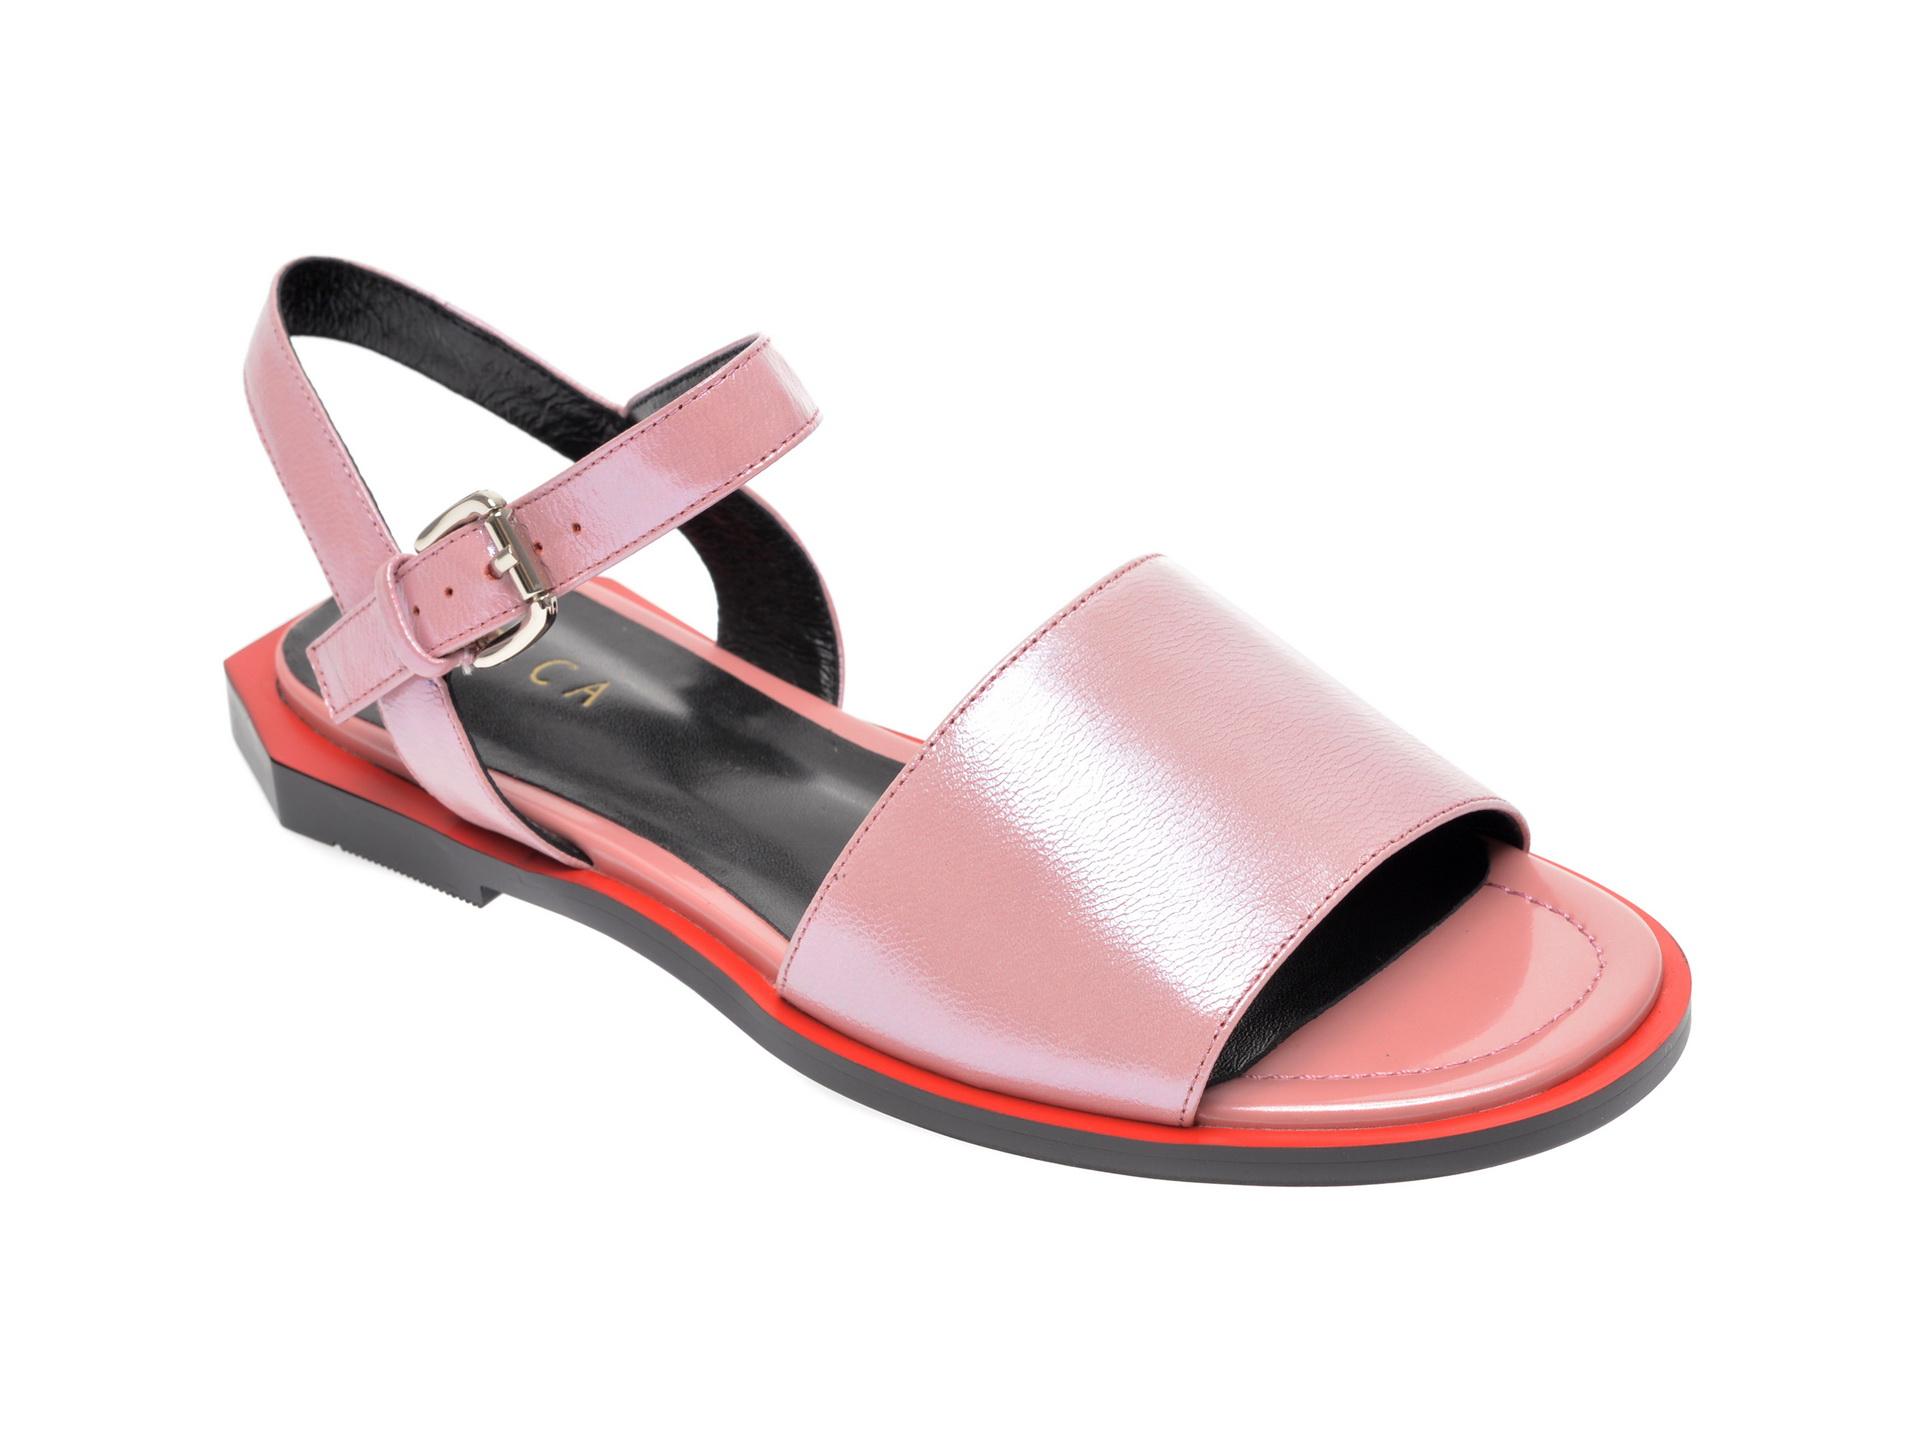 Sandale Epica Roz, 18j4000, Din Piele Naturala